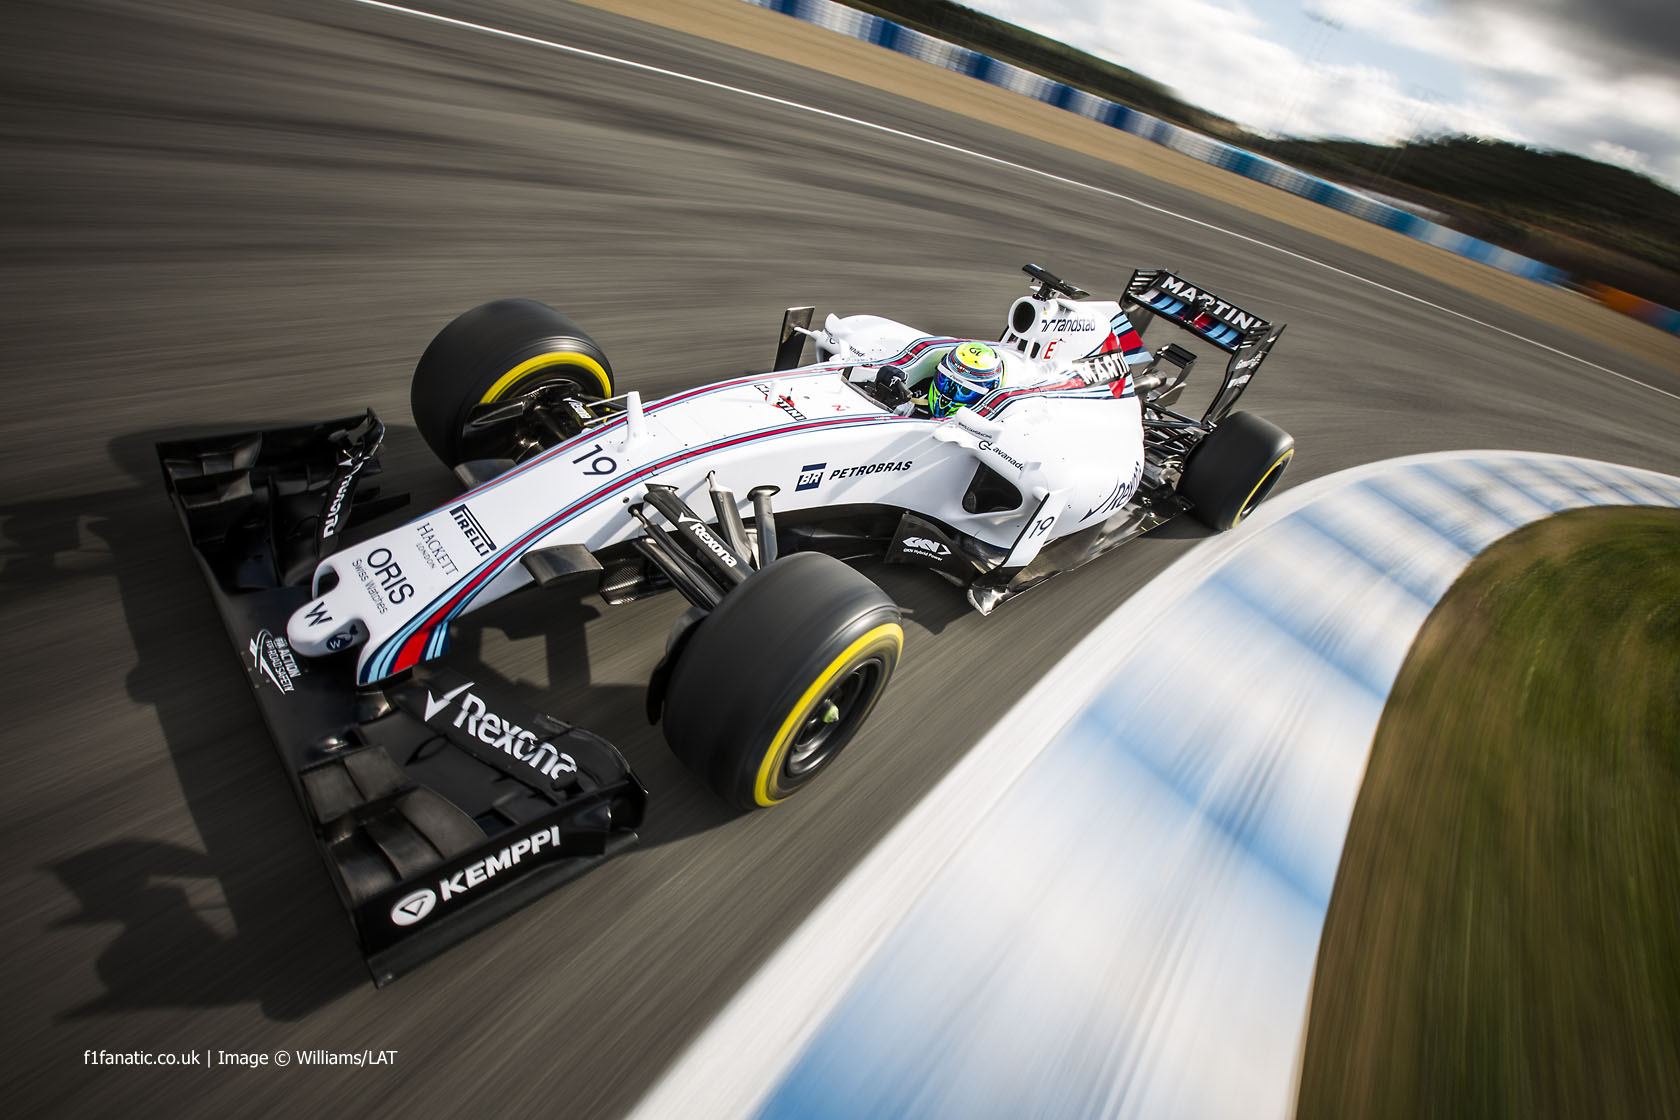 Felipe-Massa-Williams-Jerez-2015-2